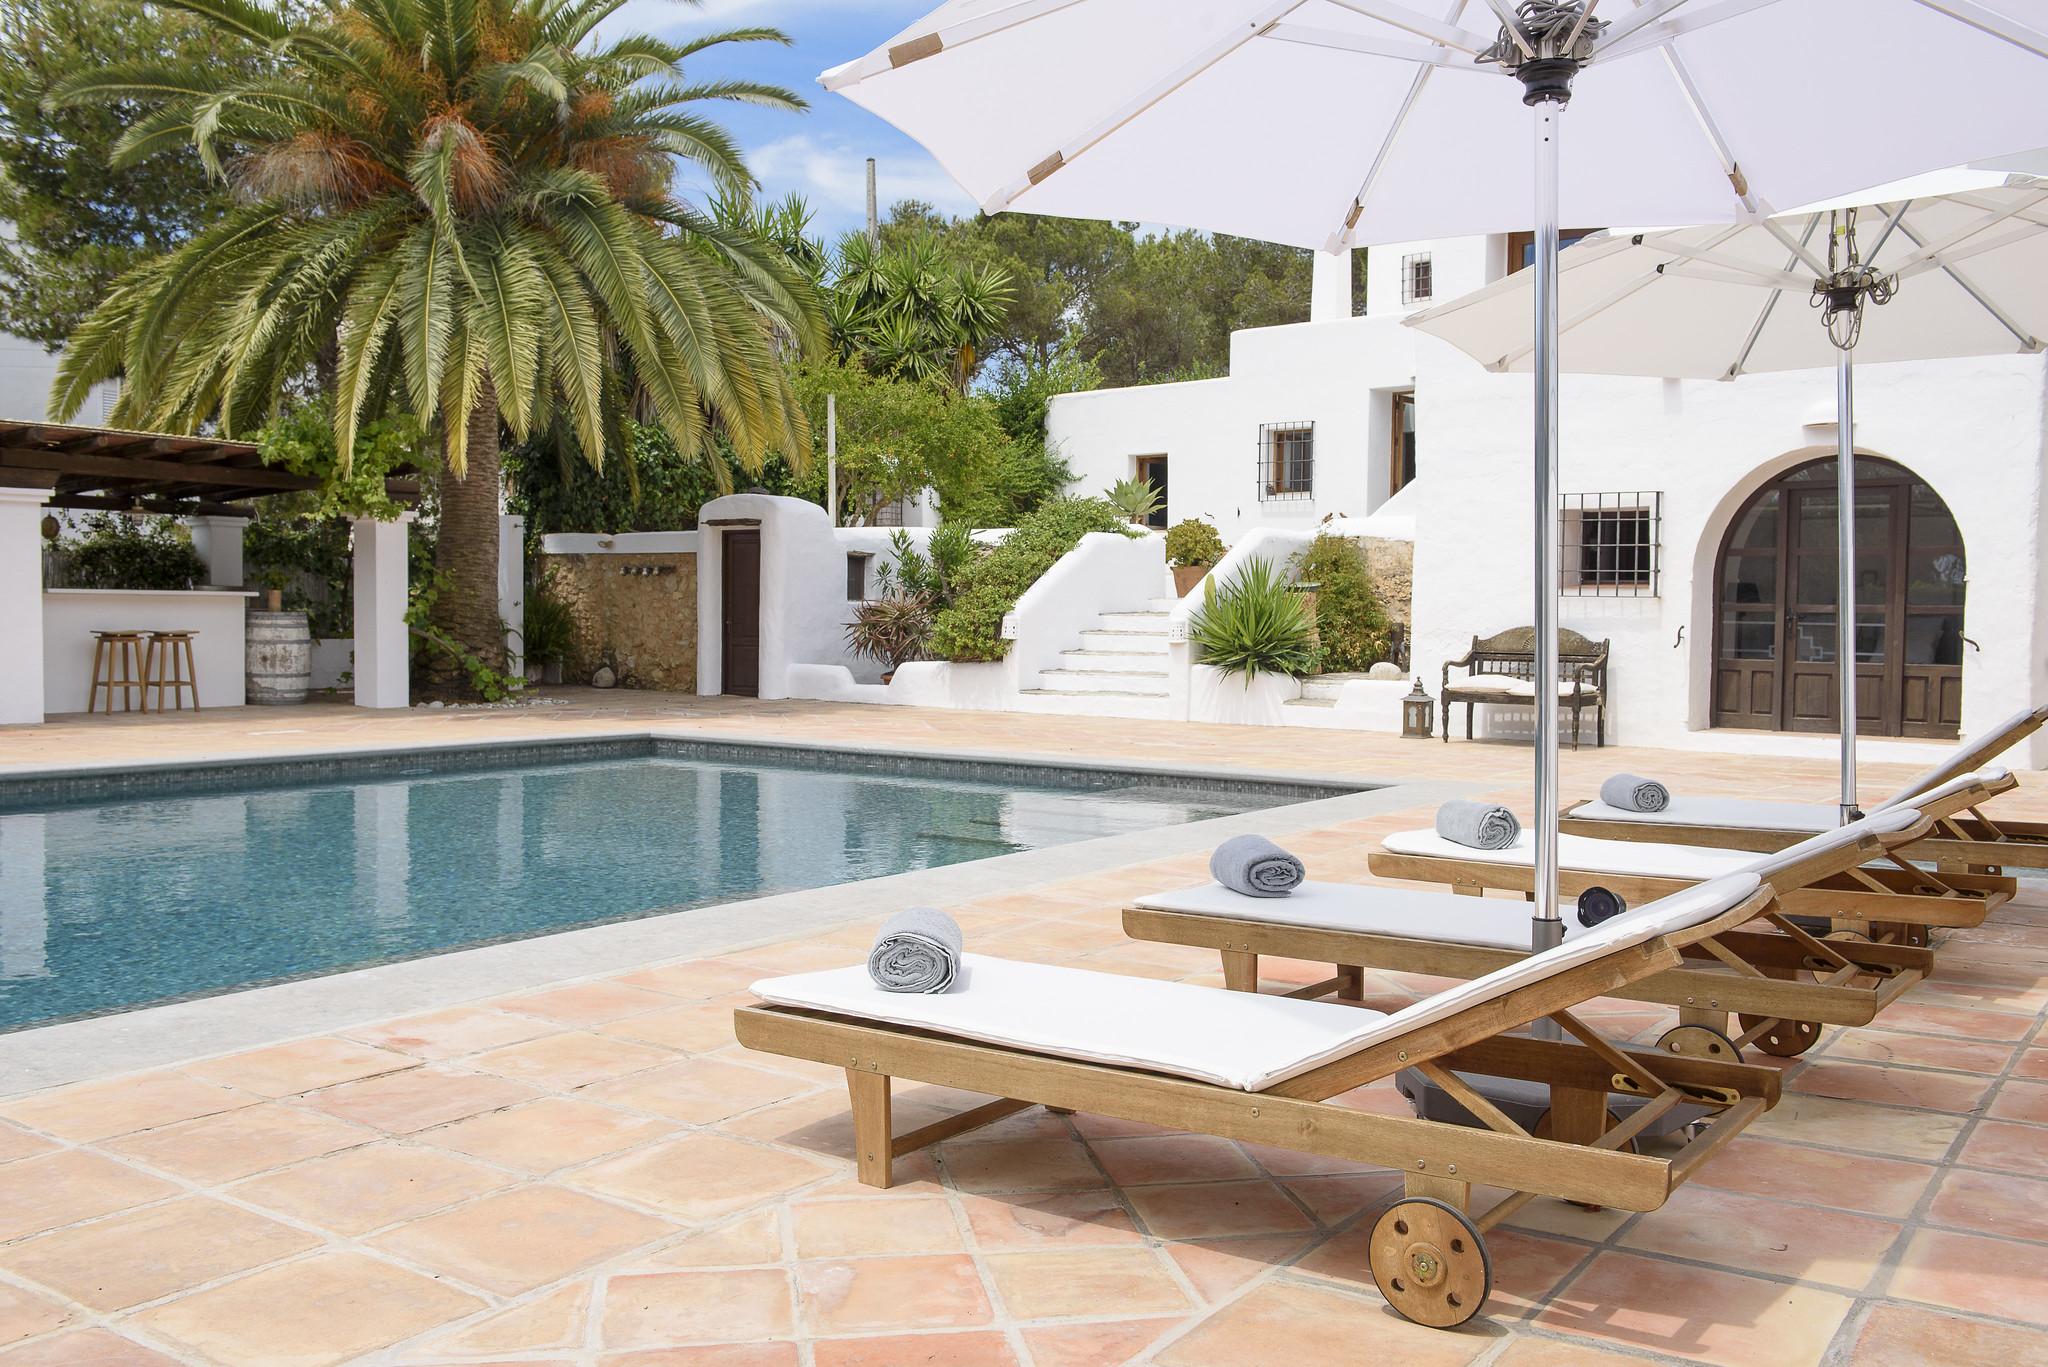 https://www.white-ibiza.com/wp-content/uploads/2020/05/white-ibiza-villas-can-lyra-sun-loungers.jpg